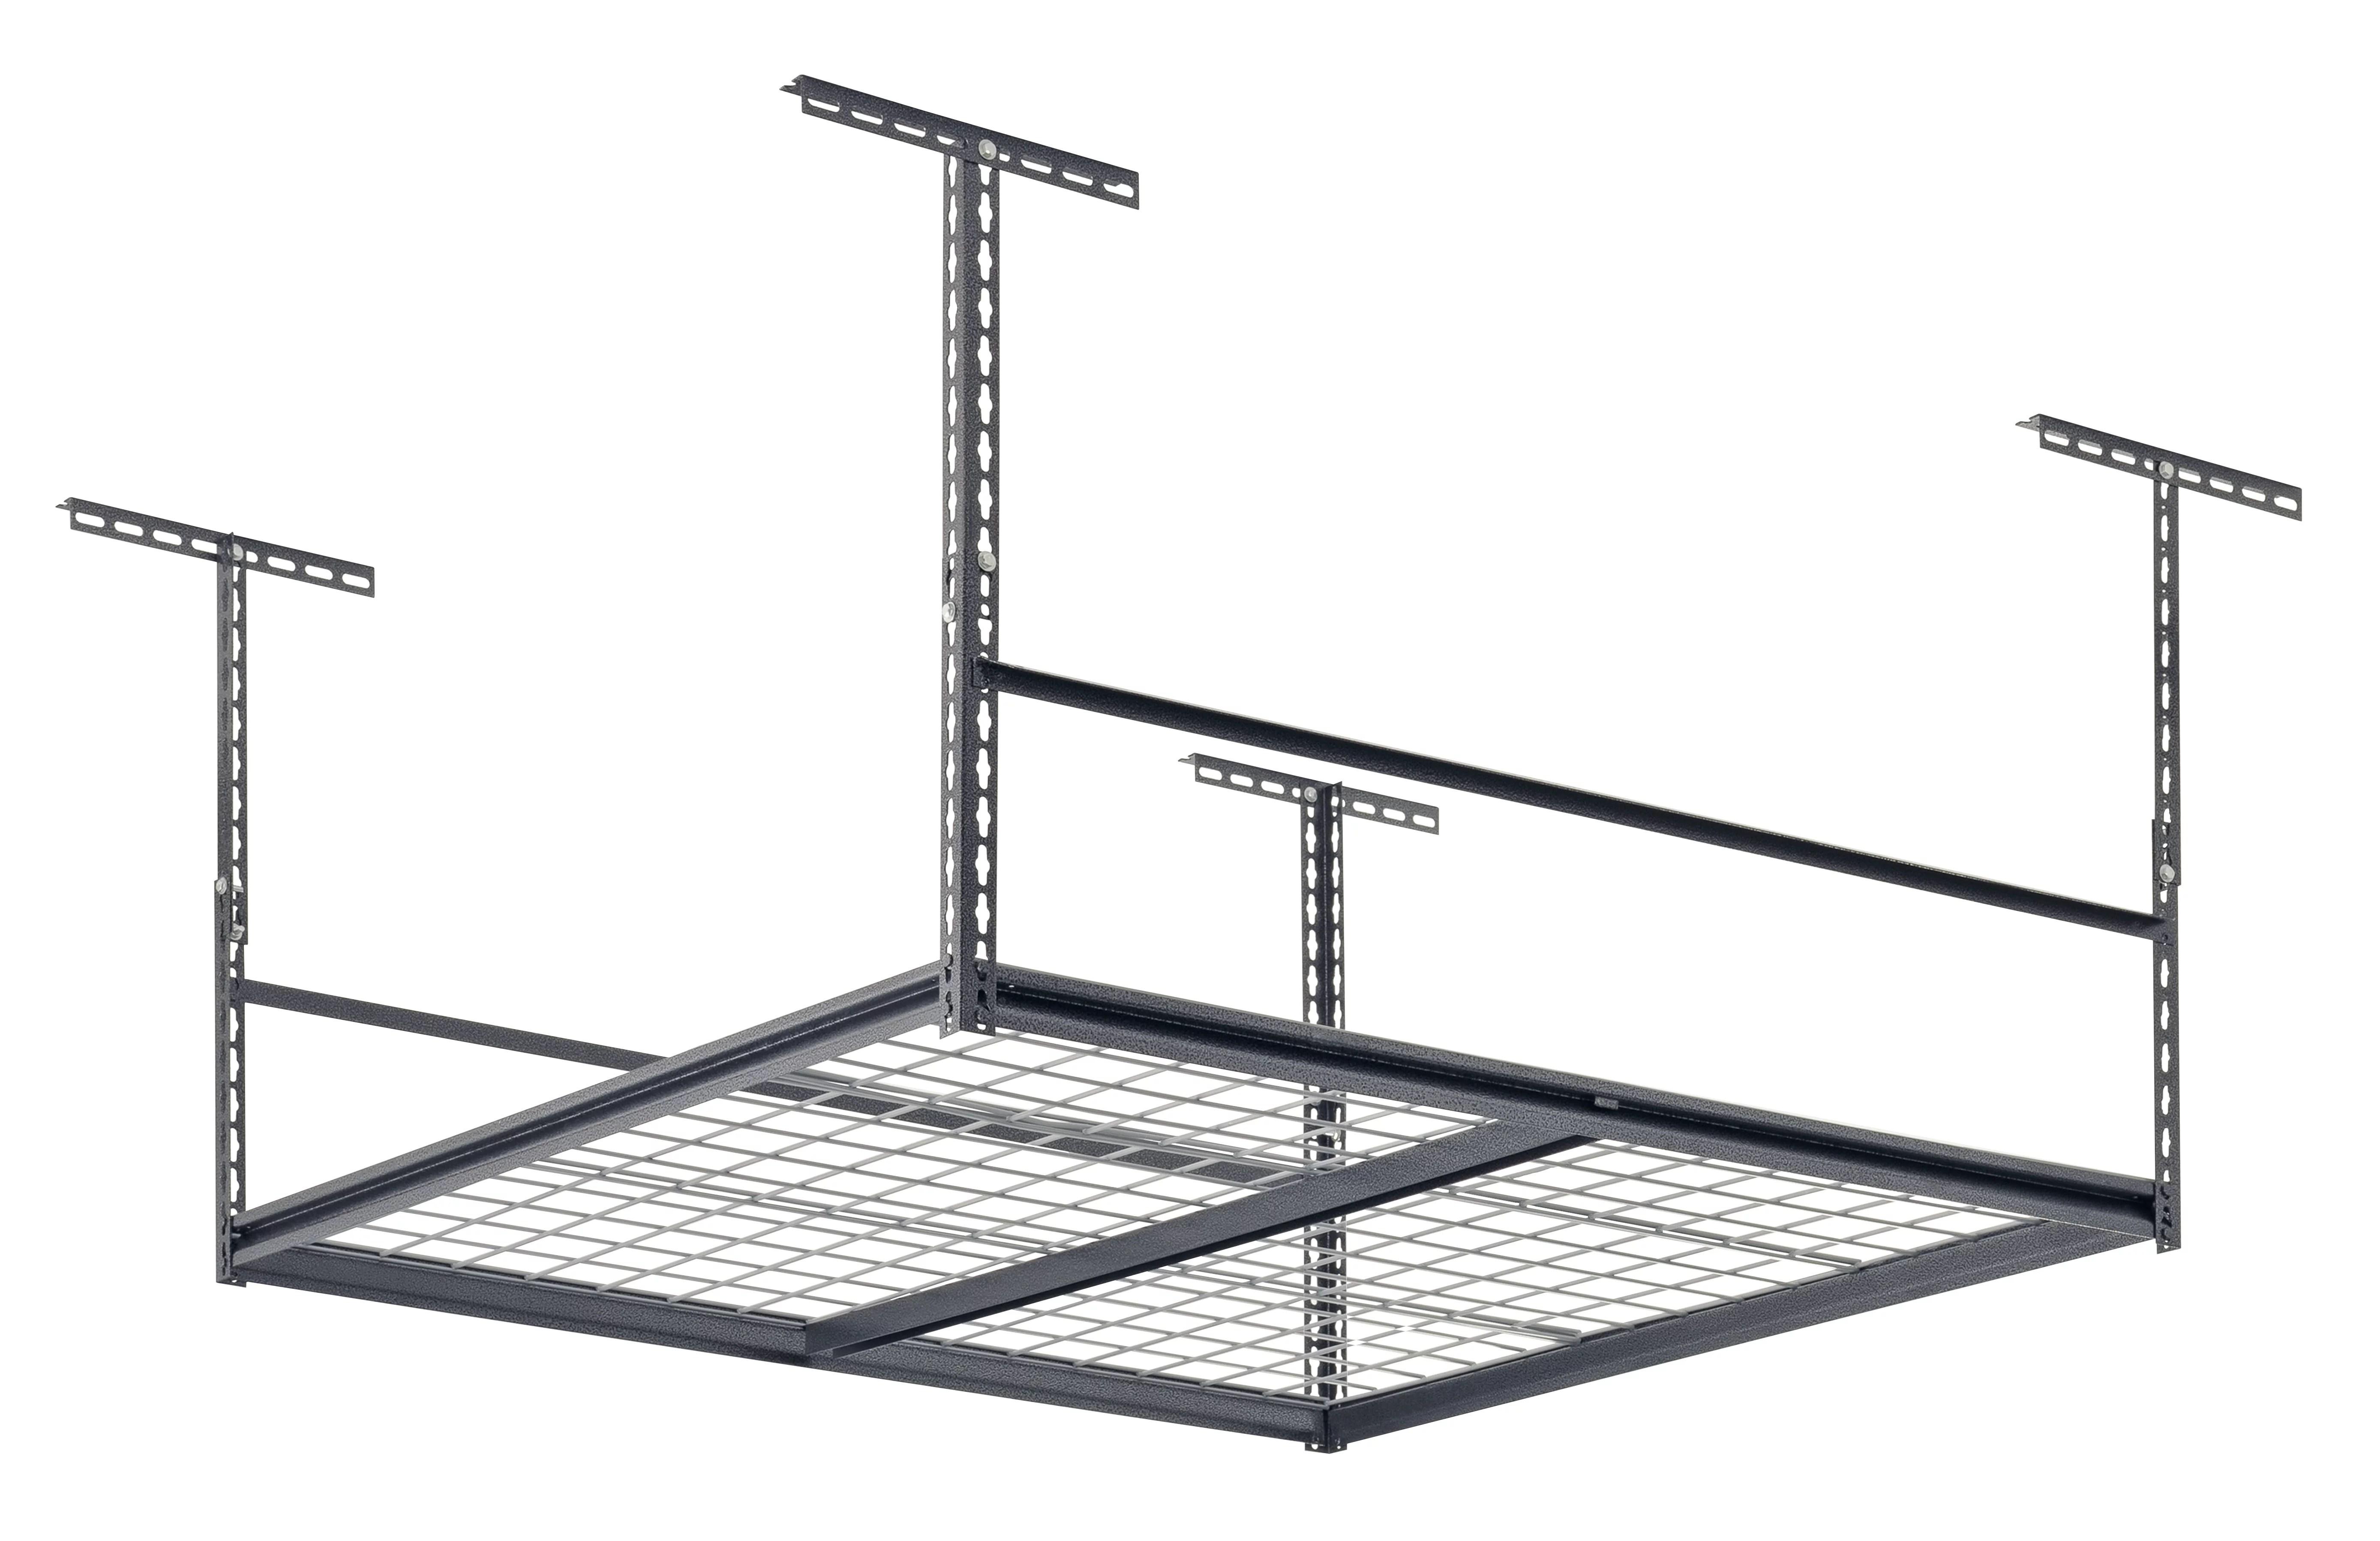 Buy Muscle Rack 48-InchW x 48-InchD Adjustable Ceiling